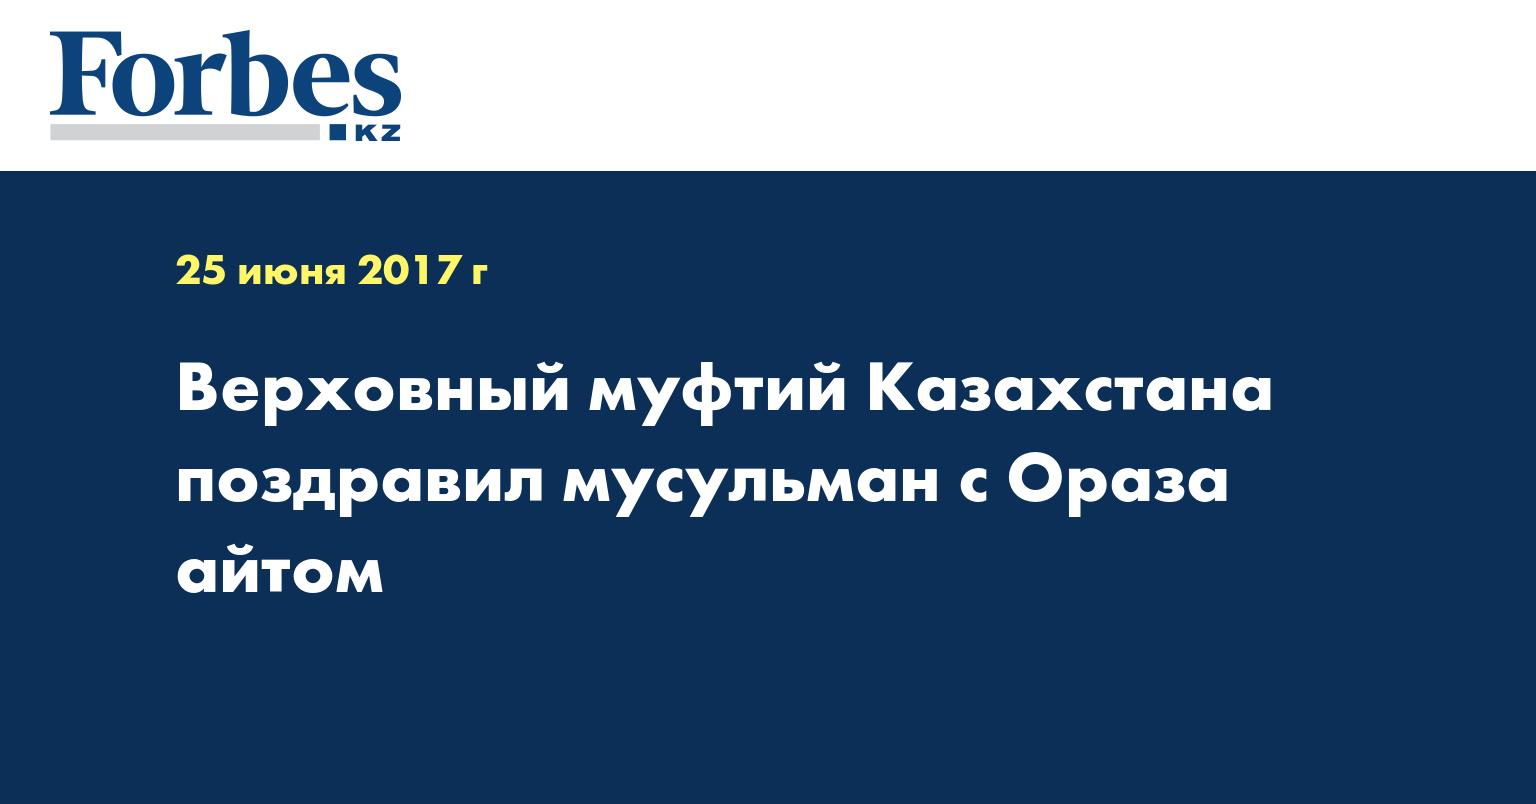 Верховный муфтий Казахстана поздравил мусульман с Ораза айтом